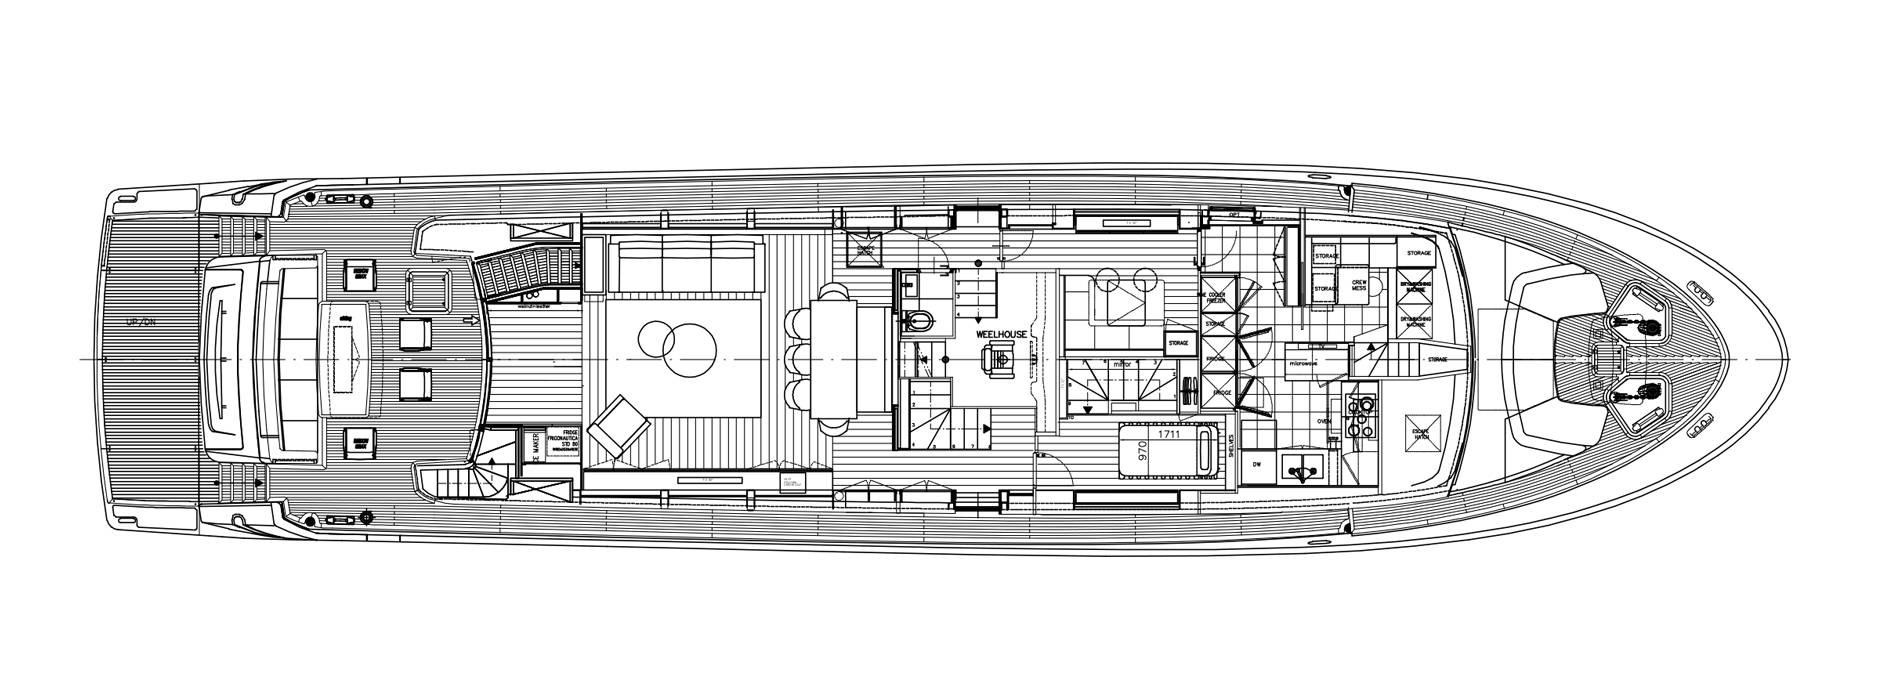 Sanlorenzo Yachts SL96-623 Hauptdeck